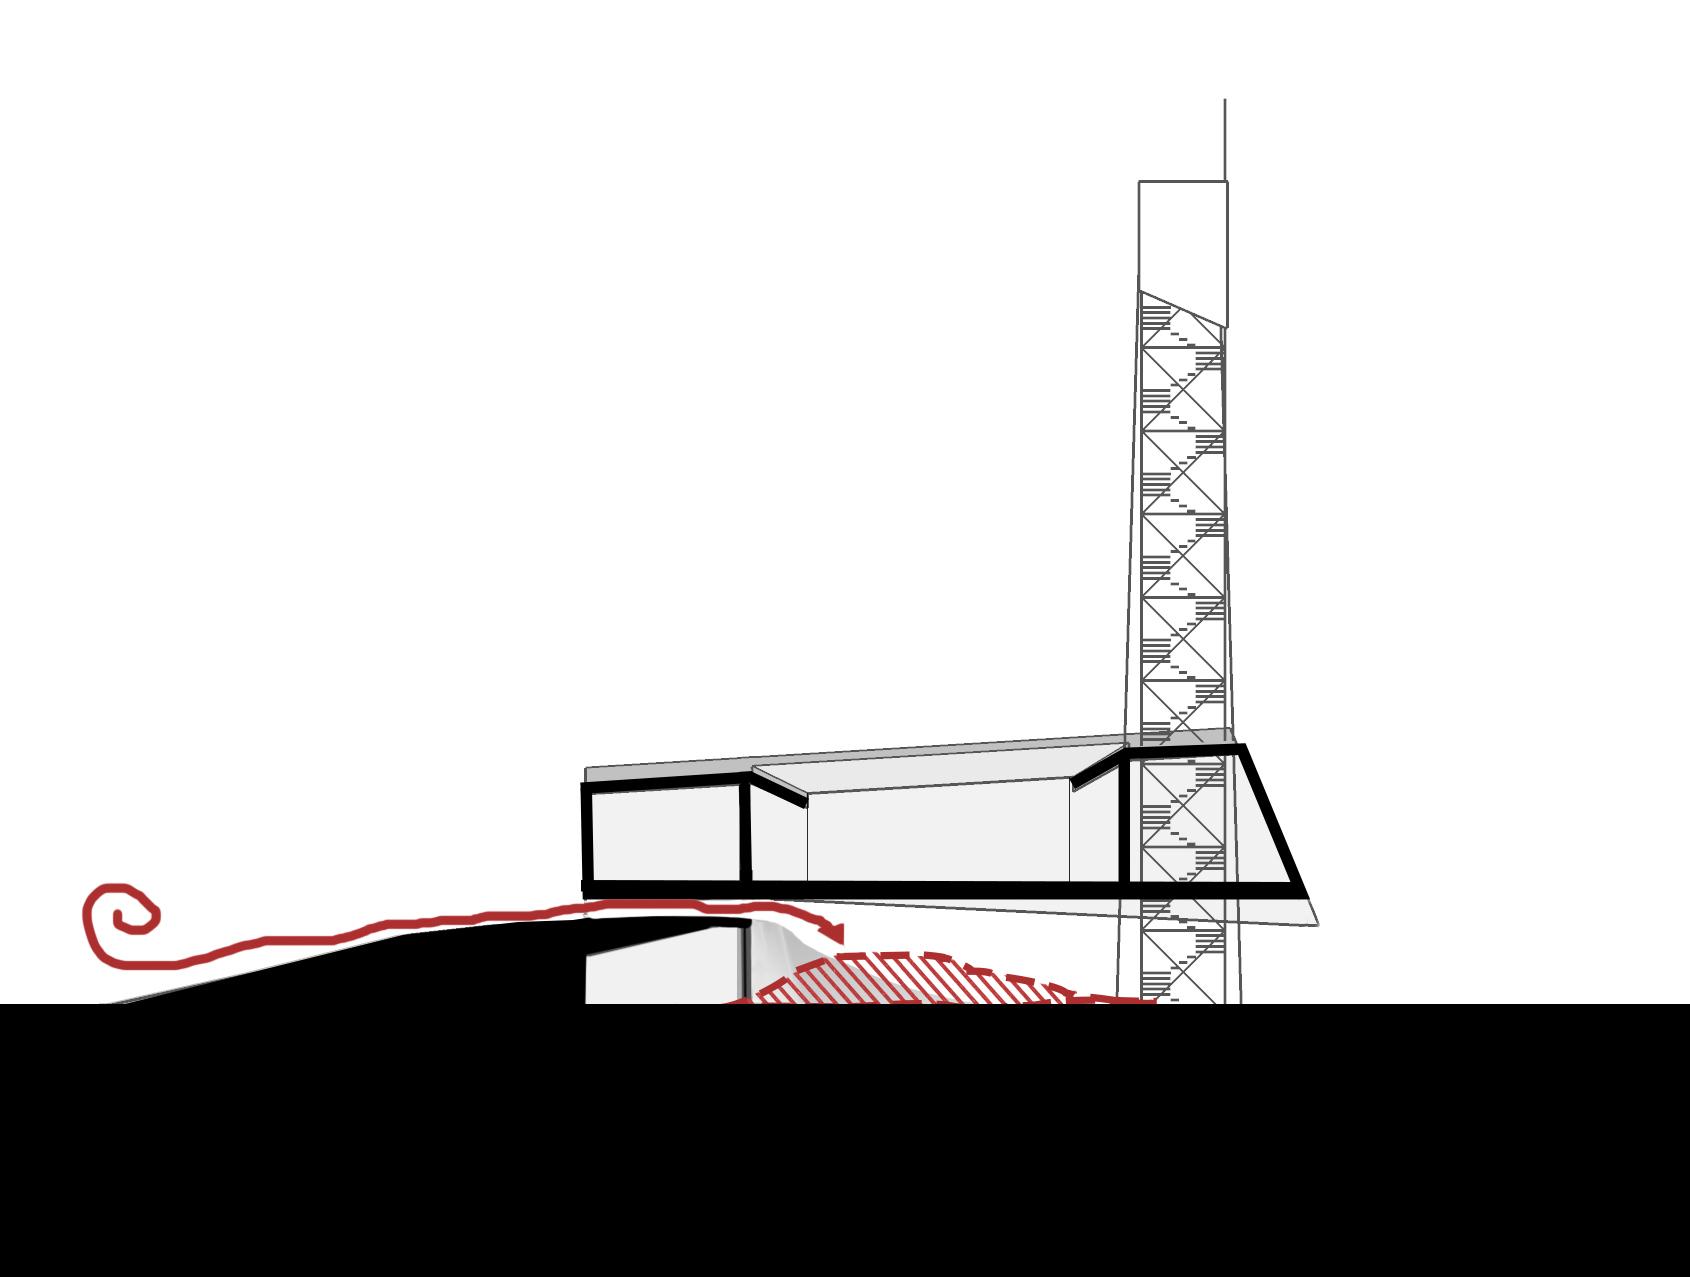 Main Station sediment section 1